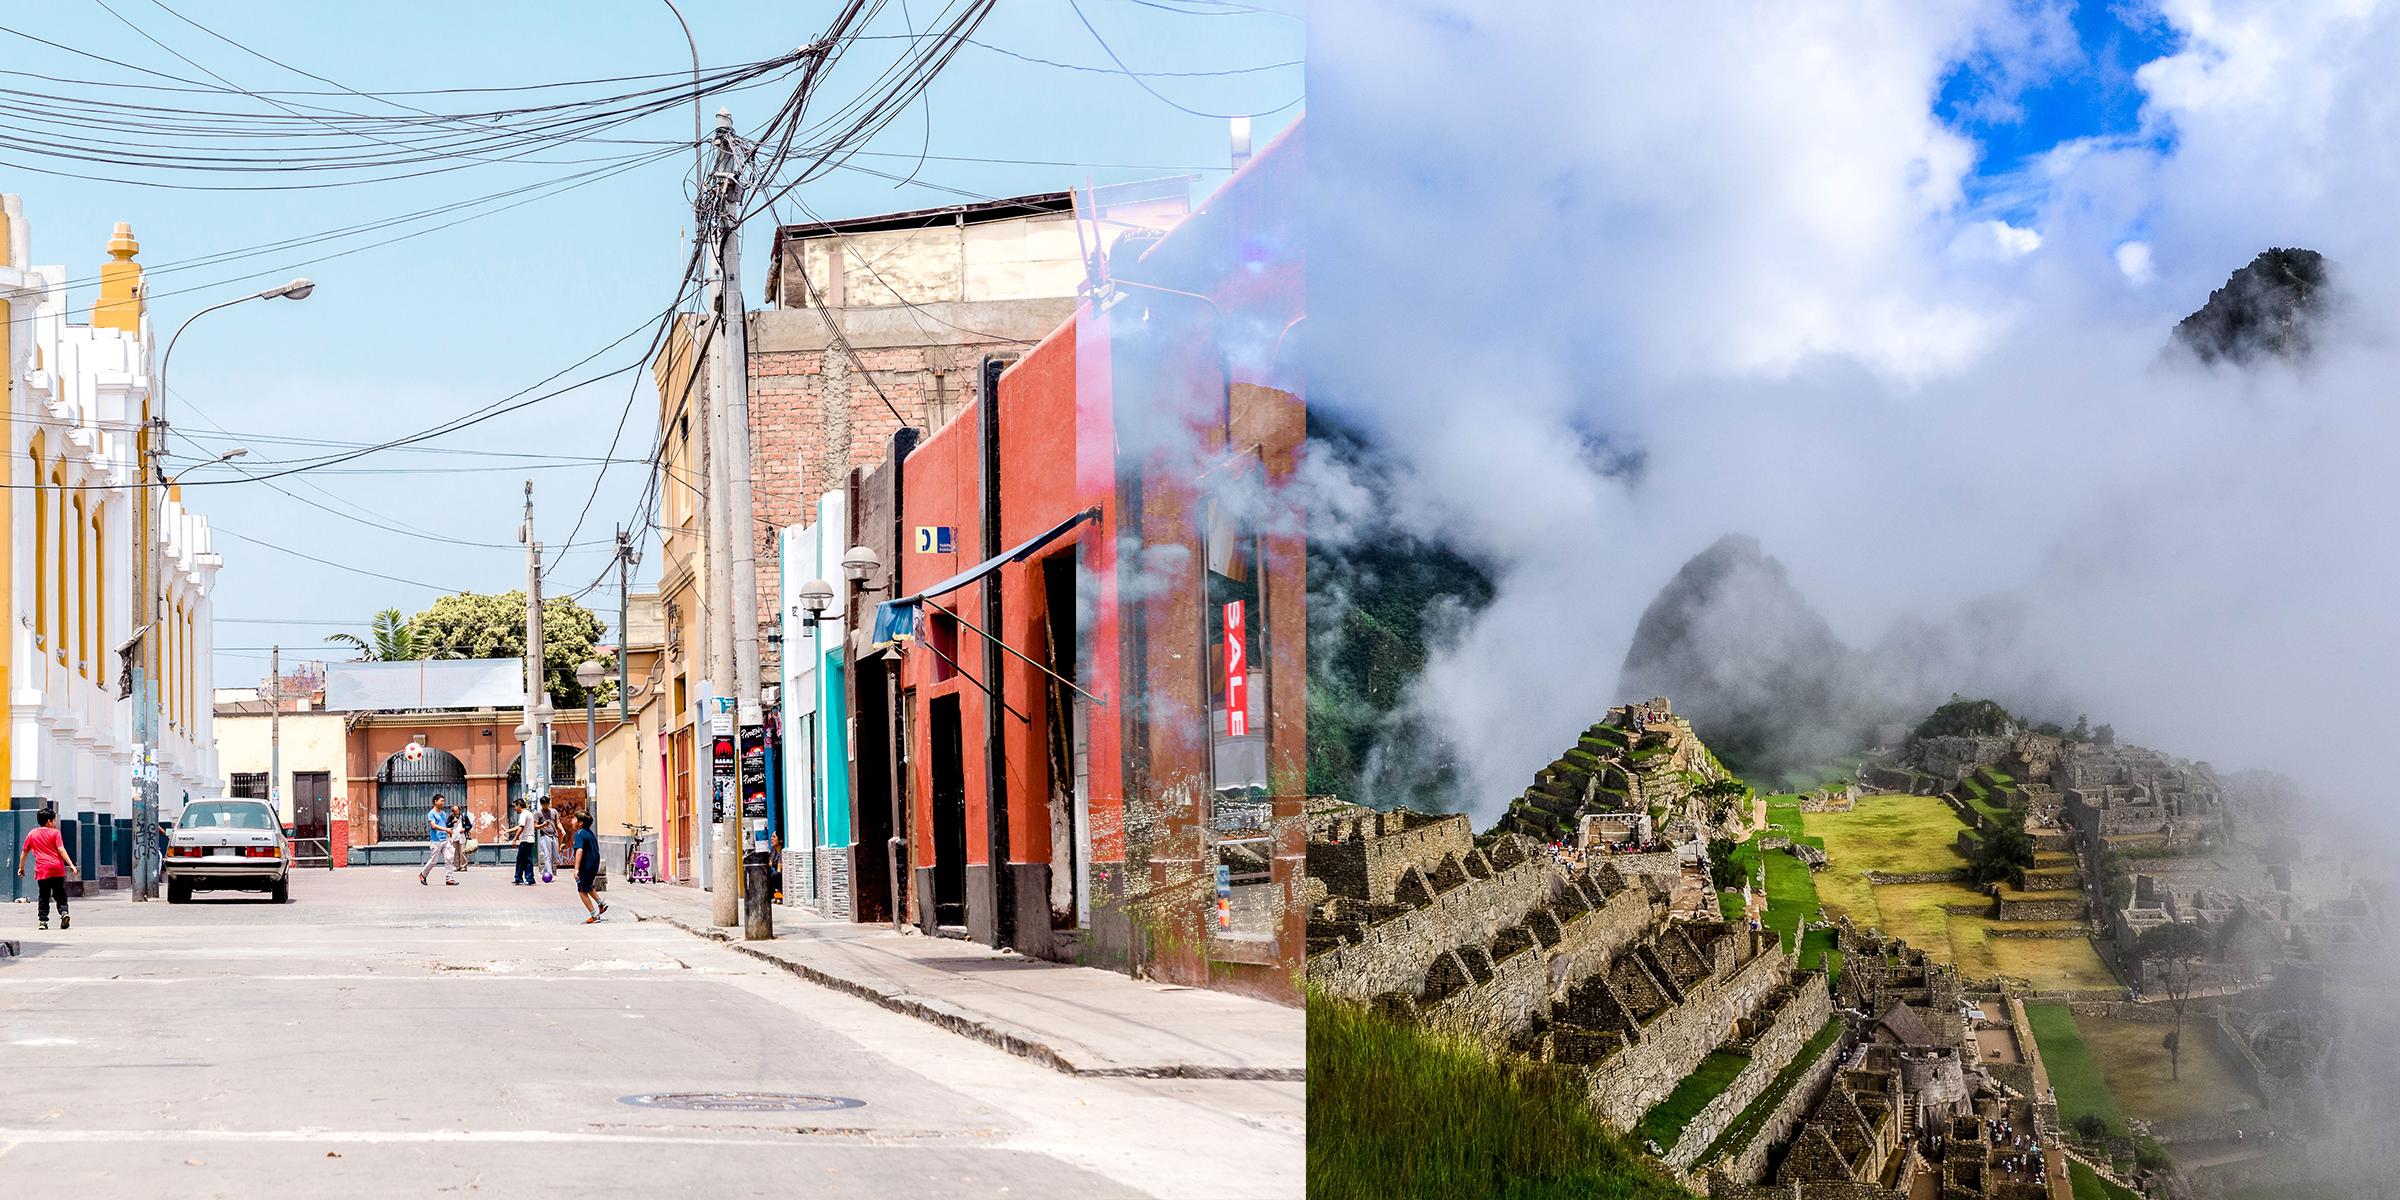 THE WILDE FAMIILY, PERU